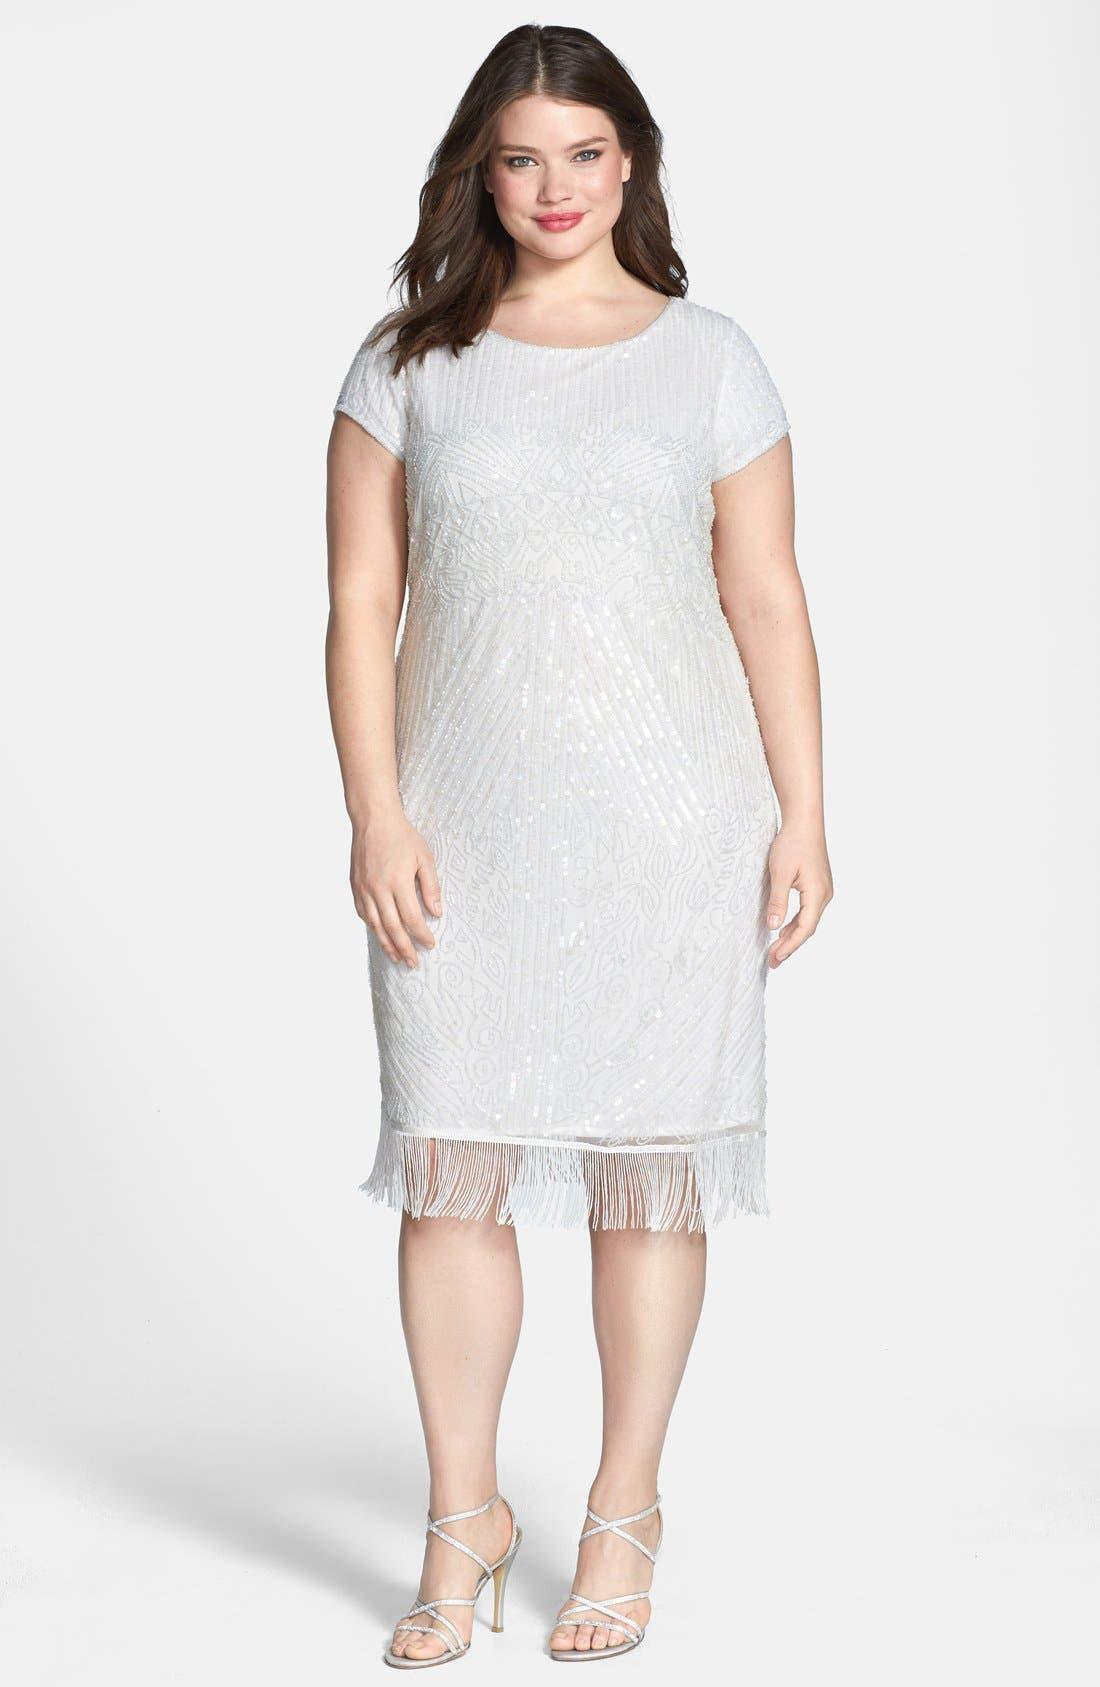 Alternate Image 1 Selected - Pisarro Nights Embellished Dress (Plus Size)